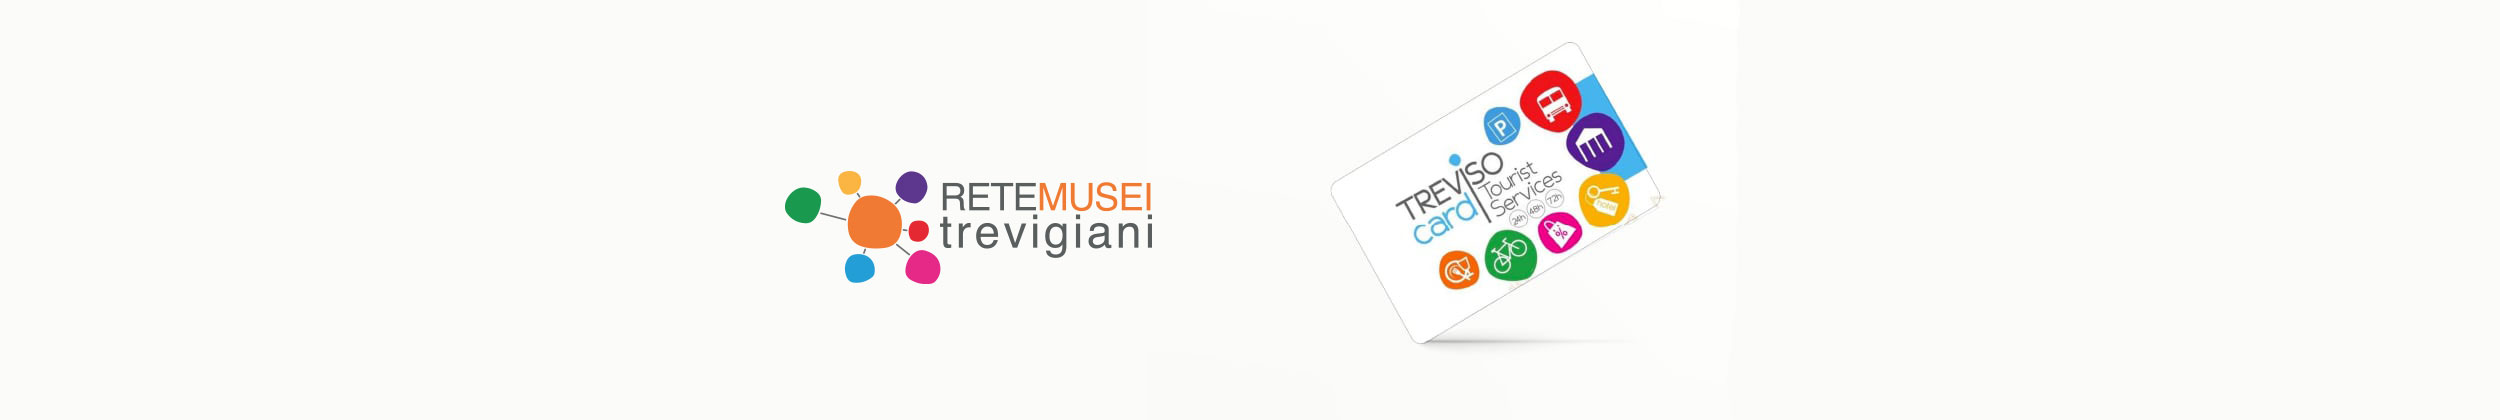 Rete Musei Trevigiani